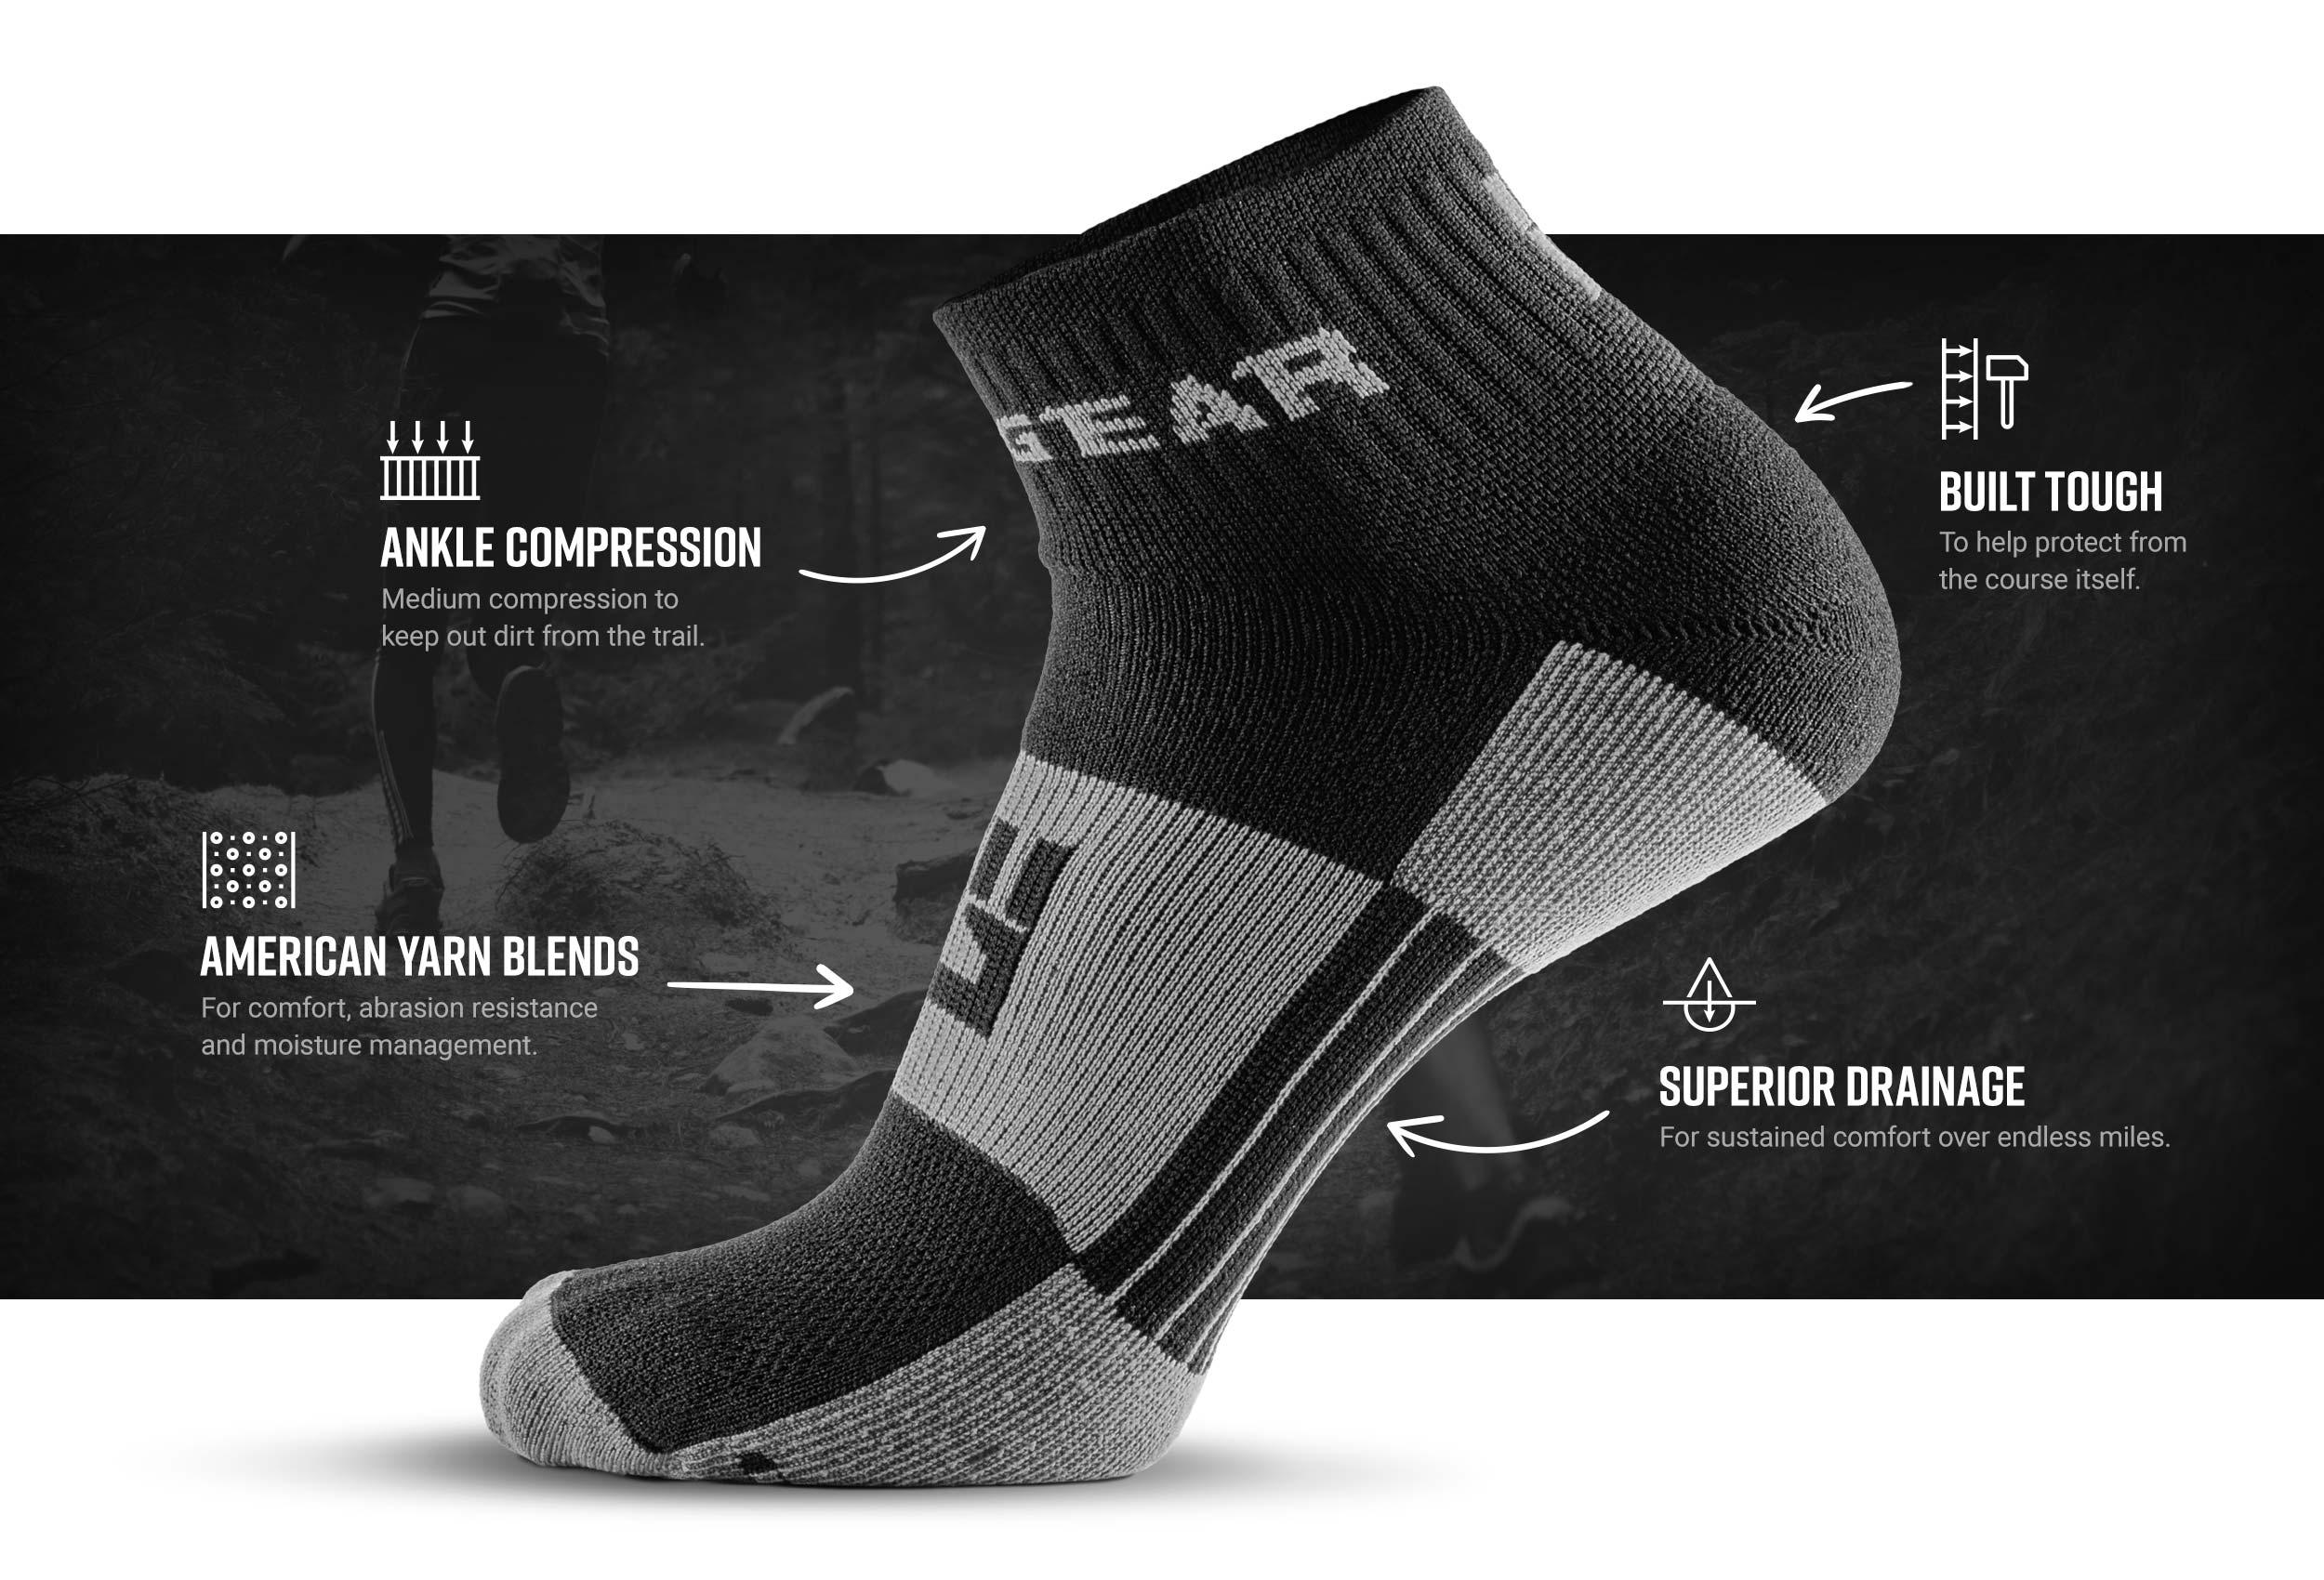 Infographic of 1/4 Crew Socks - Black/Gray (2 pair pack)